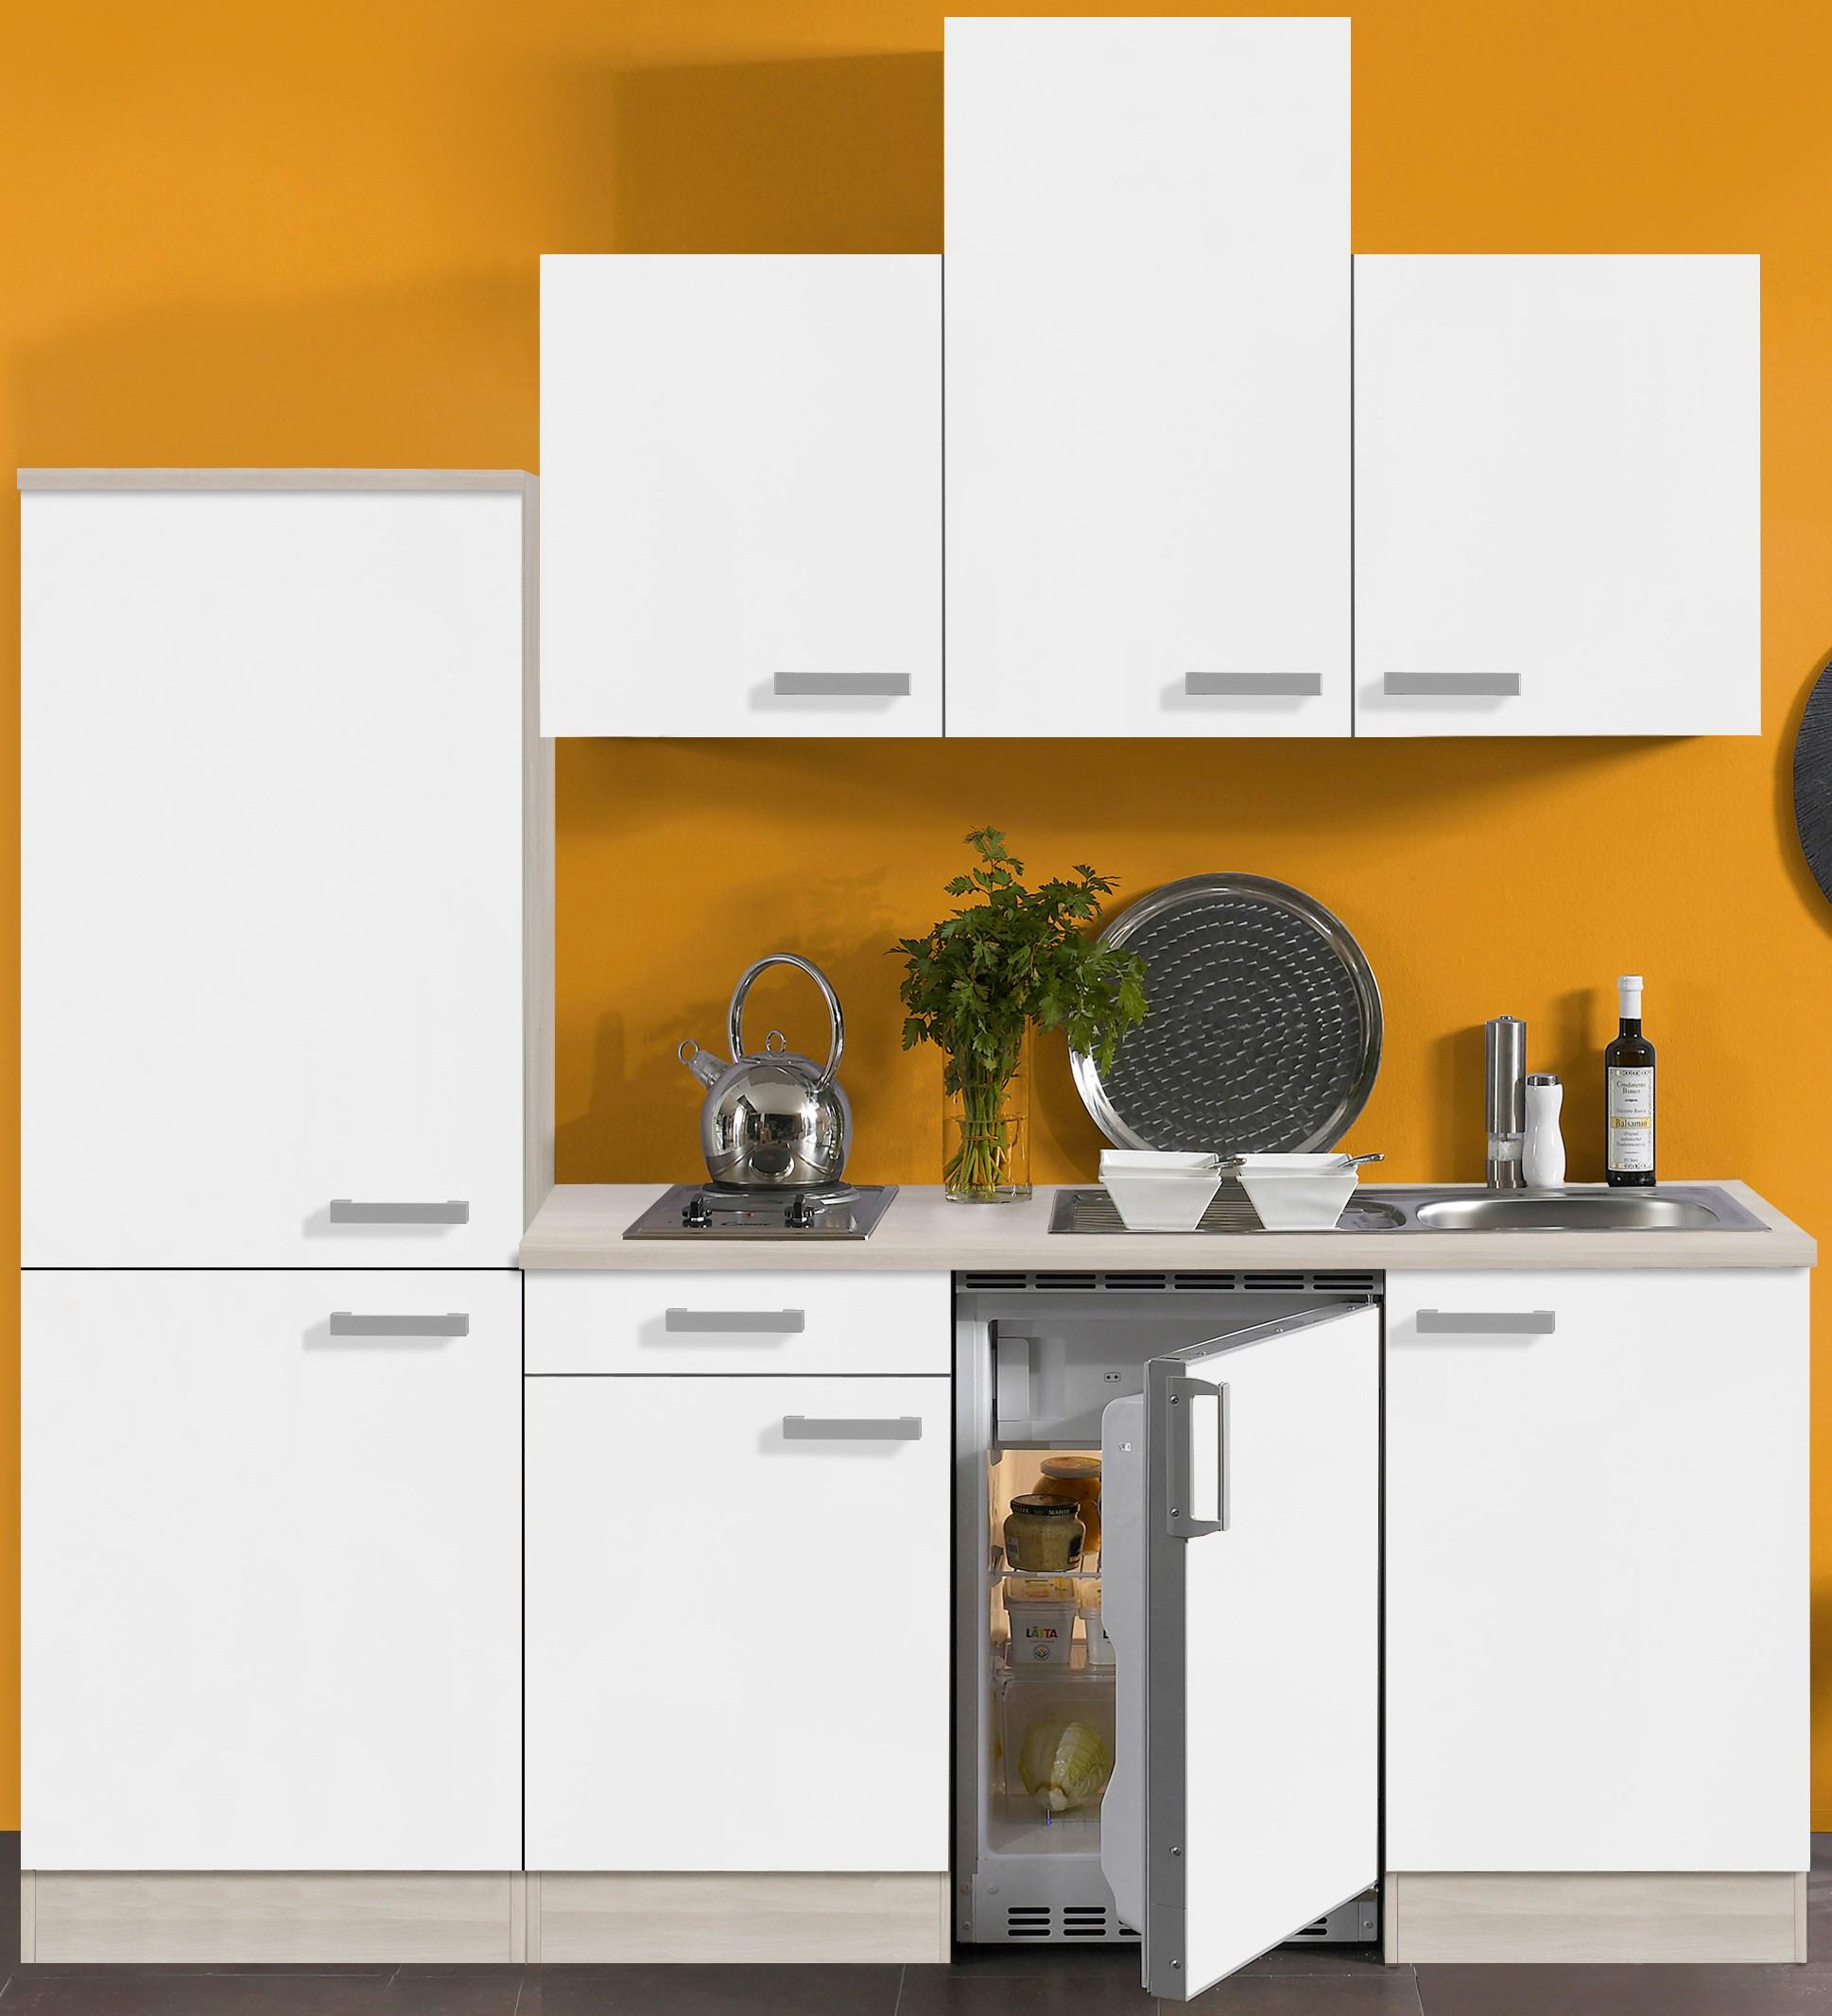 singlek che barcelona vario 2 mit elektro kochfeld breite 210 cm wei k che singlek chen. Black Bedroom Furniture Sets. Home Design Ideas